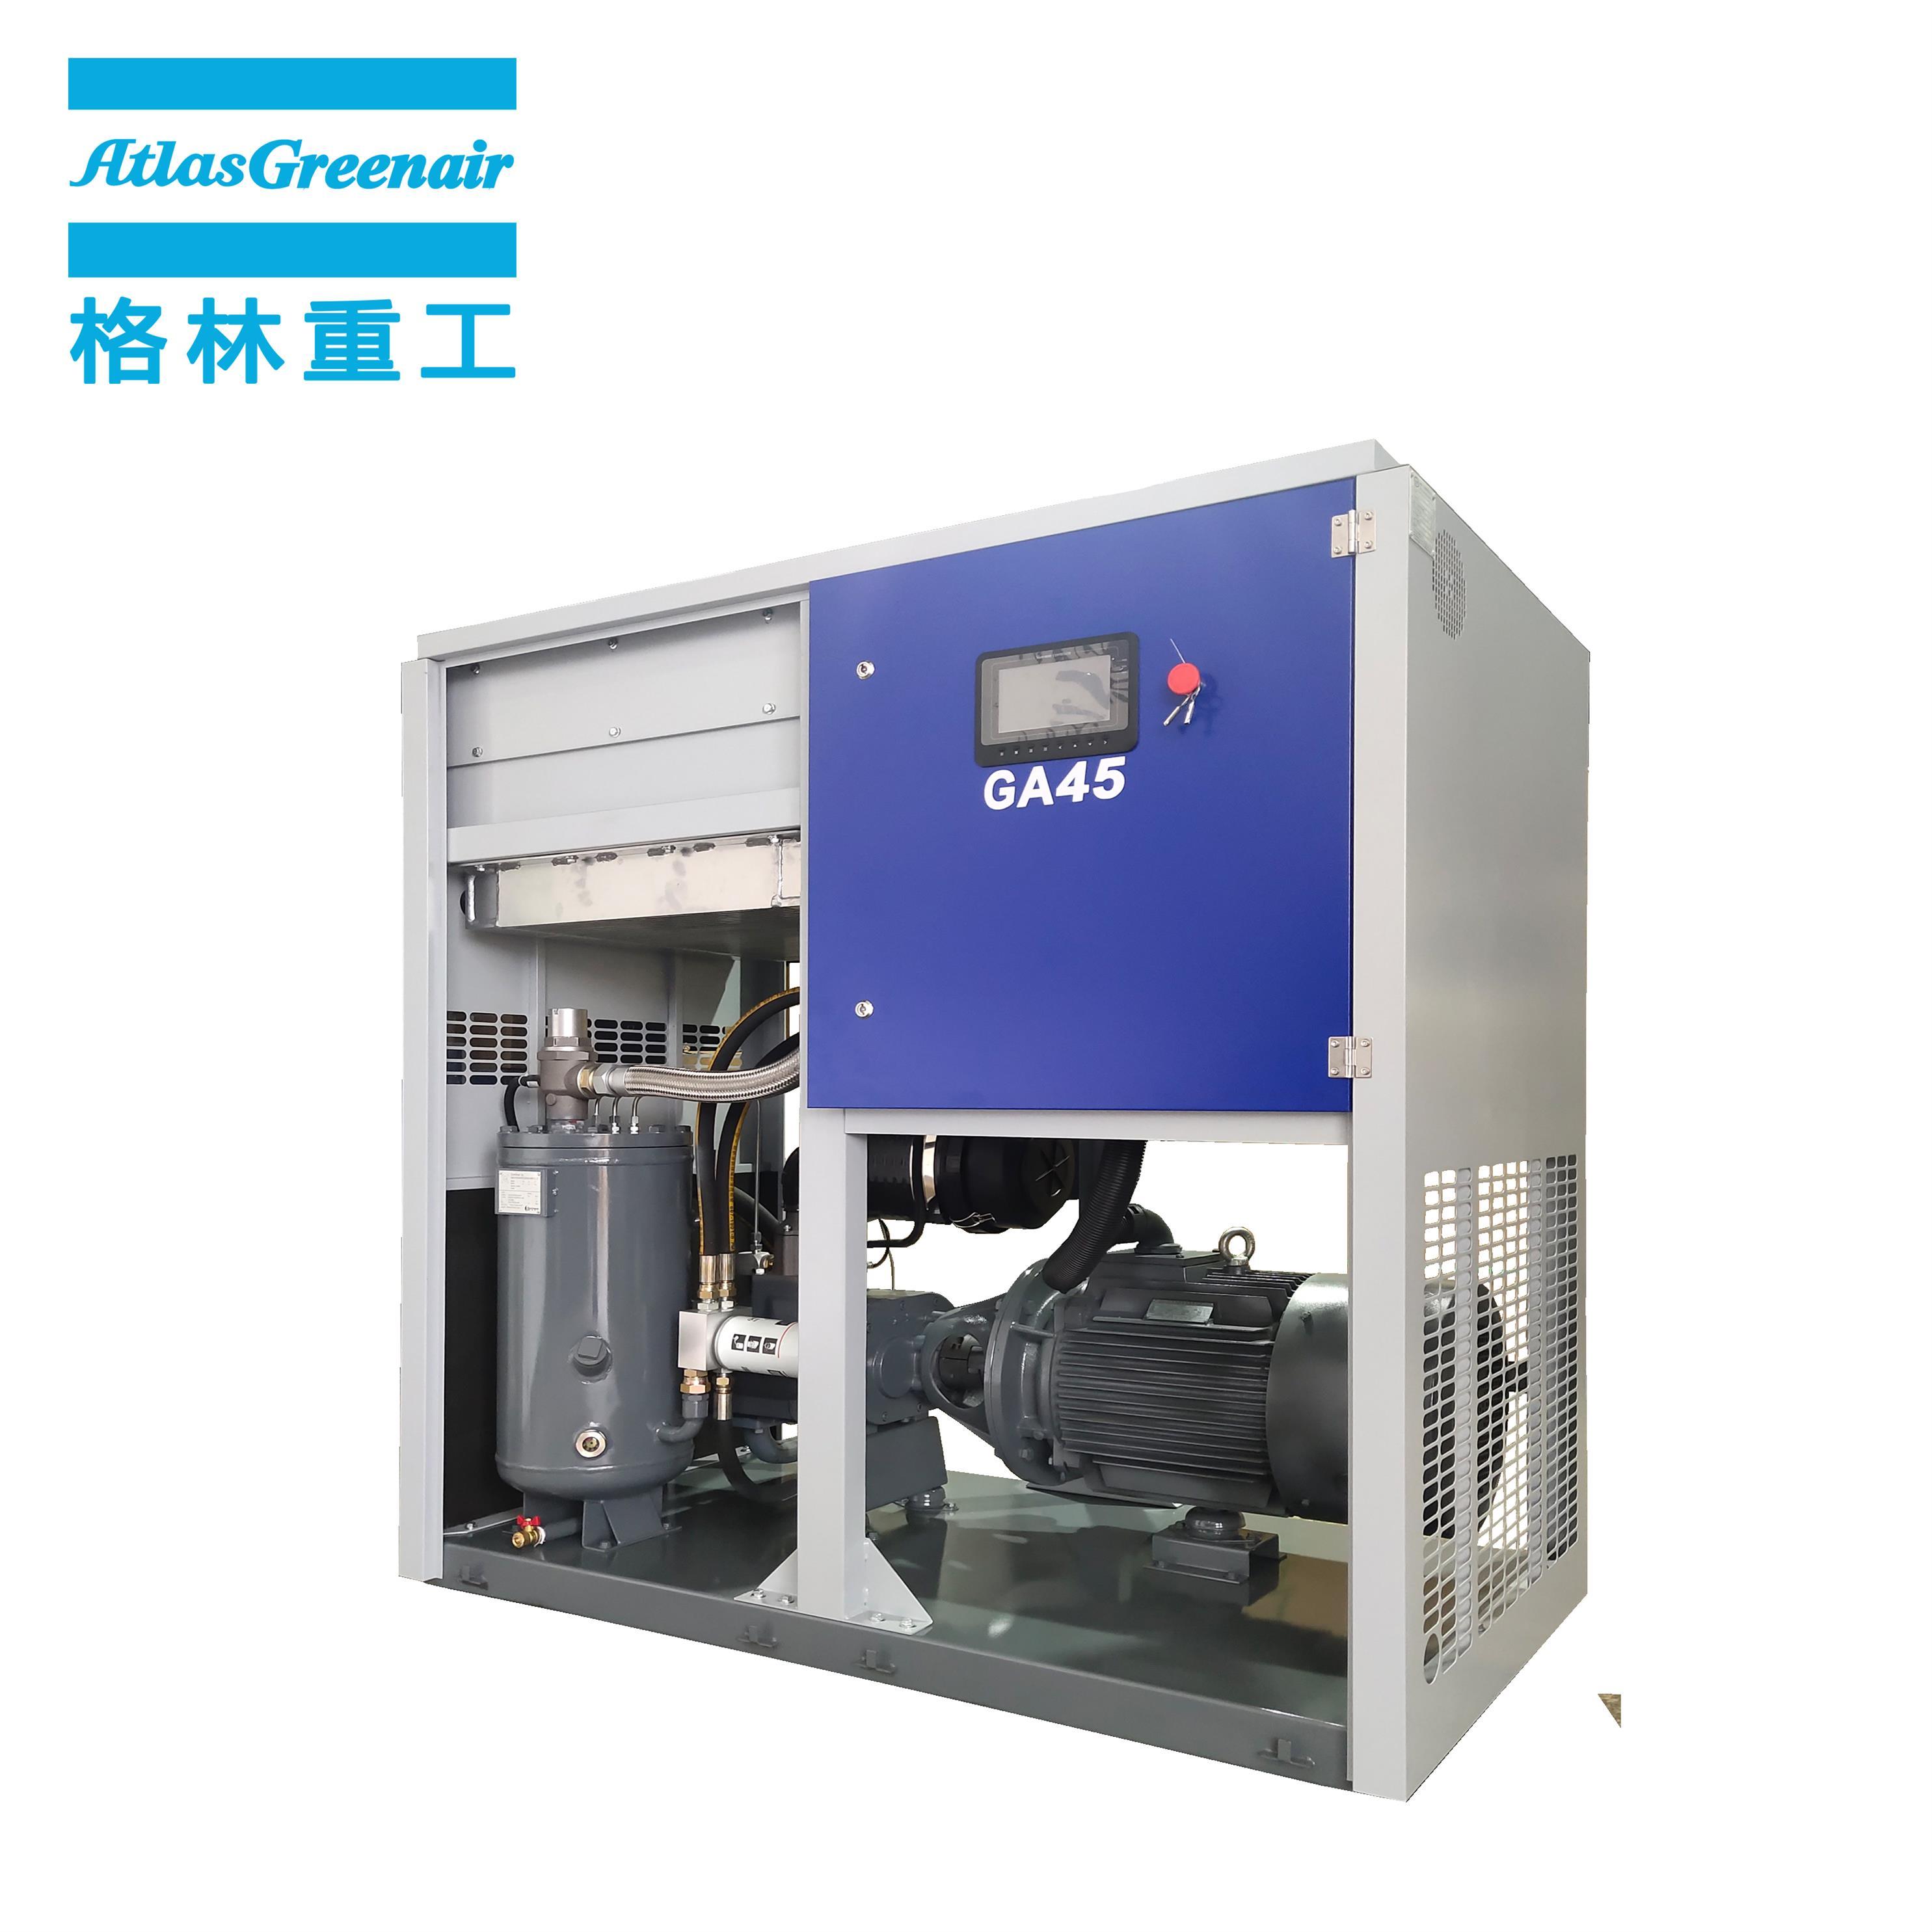 Atlas Greenair Screw Air Compressor fixed speed rotary screw air compressor company for tropical area-1